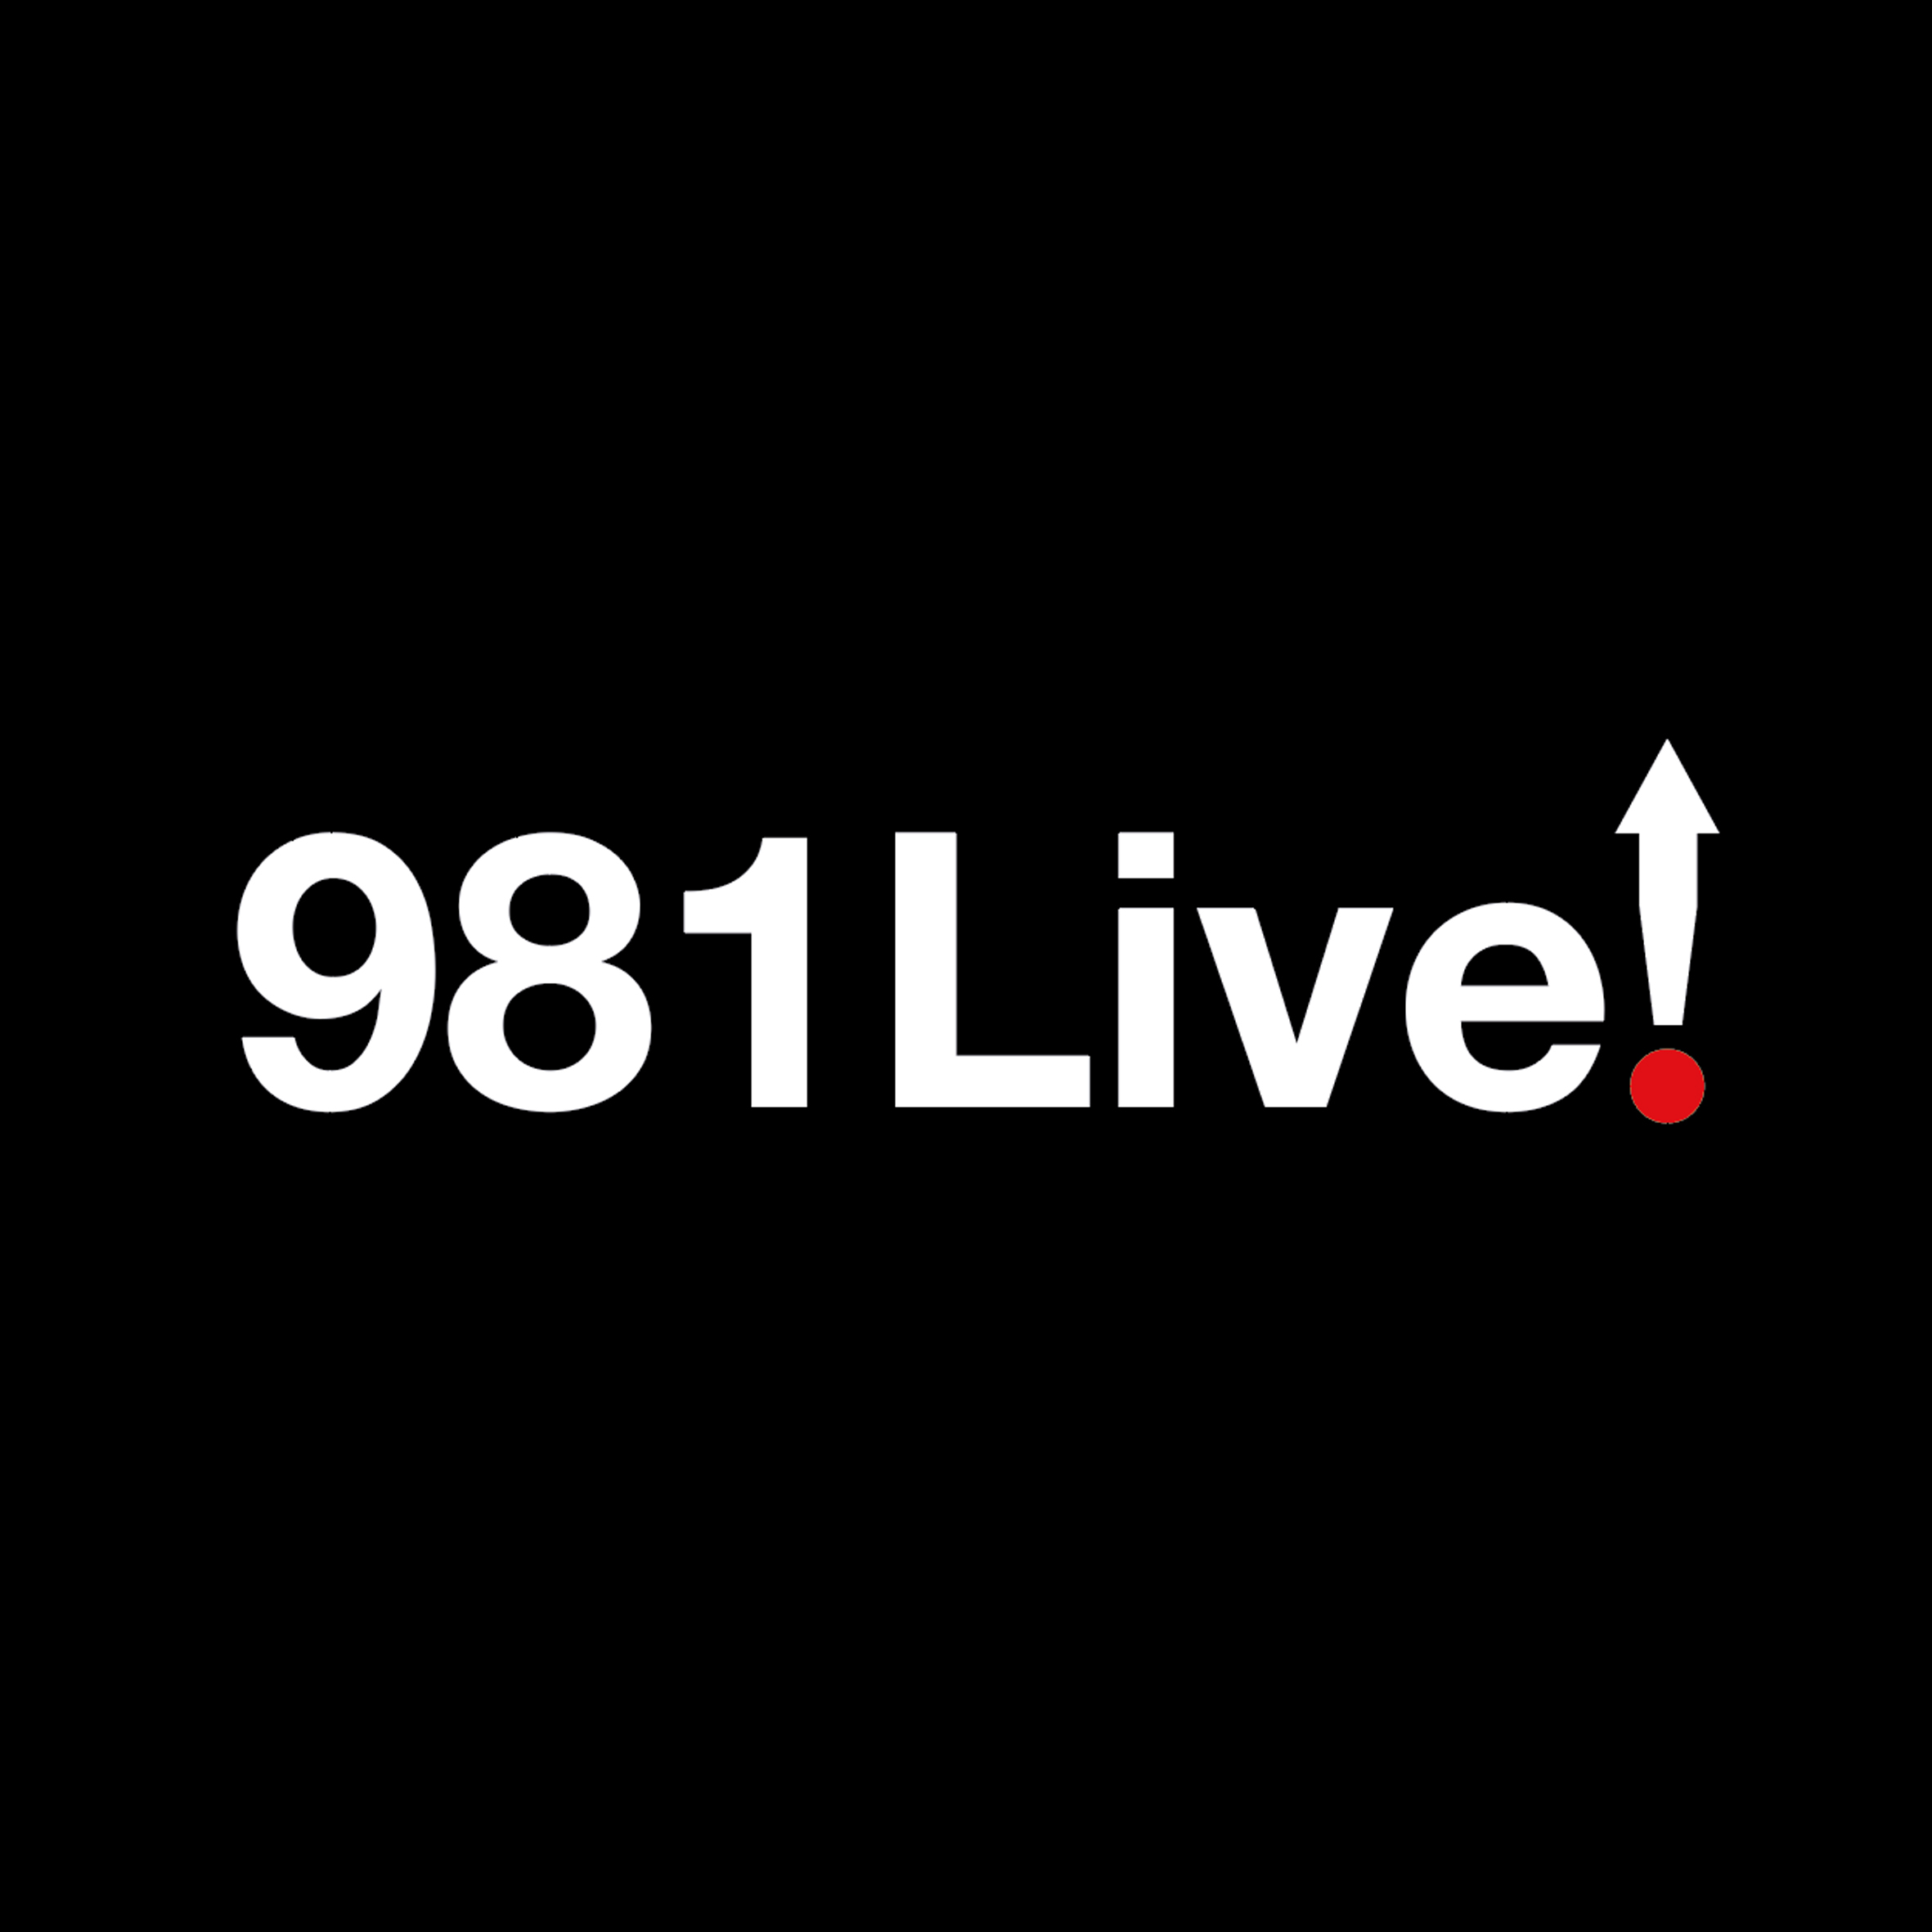 981Live!